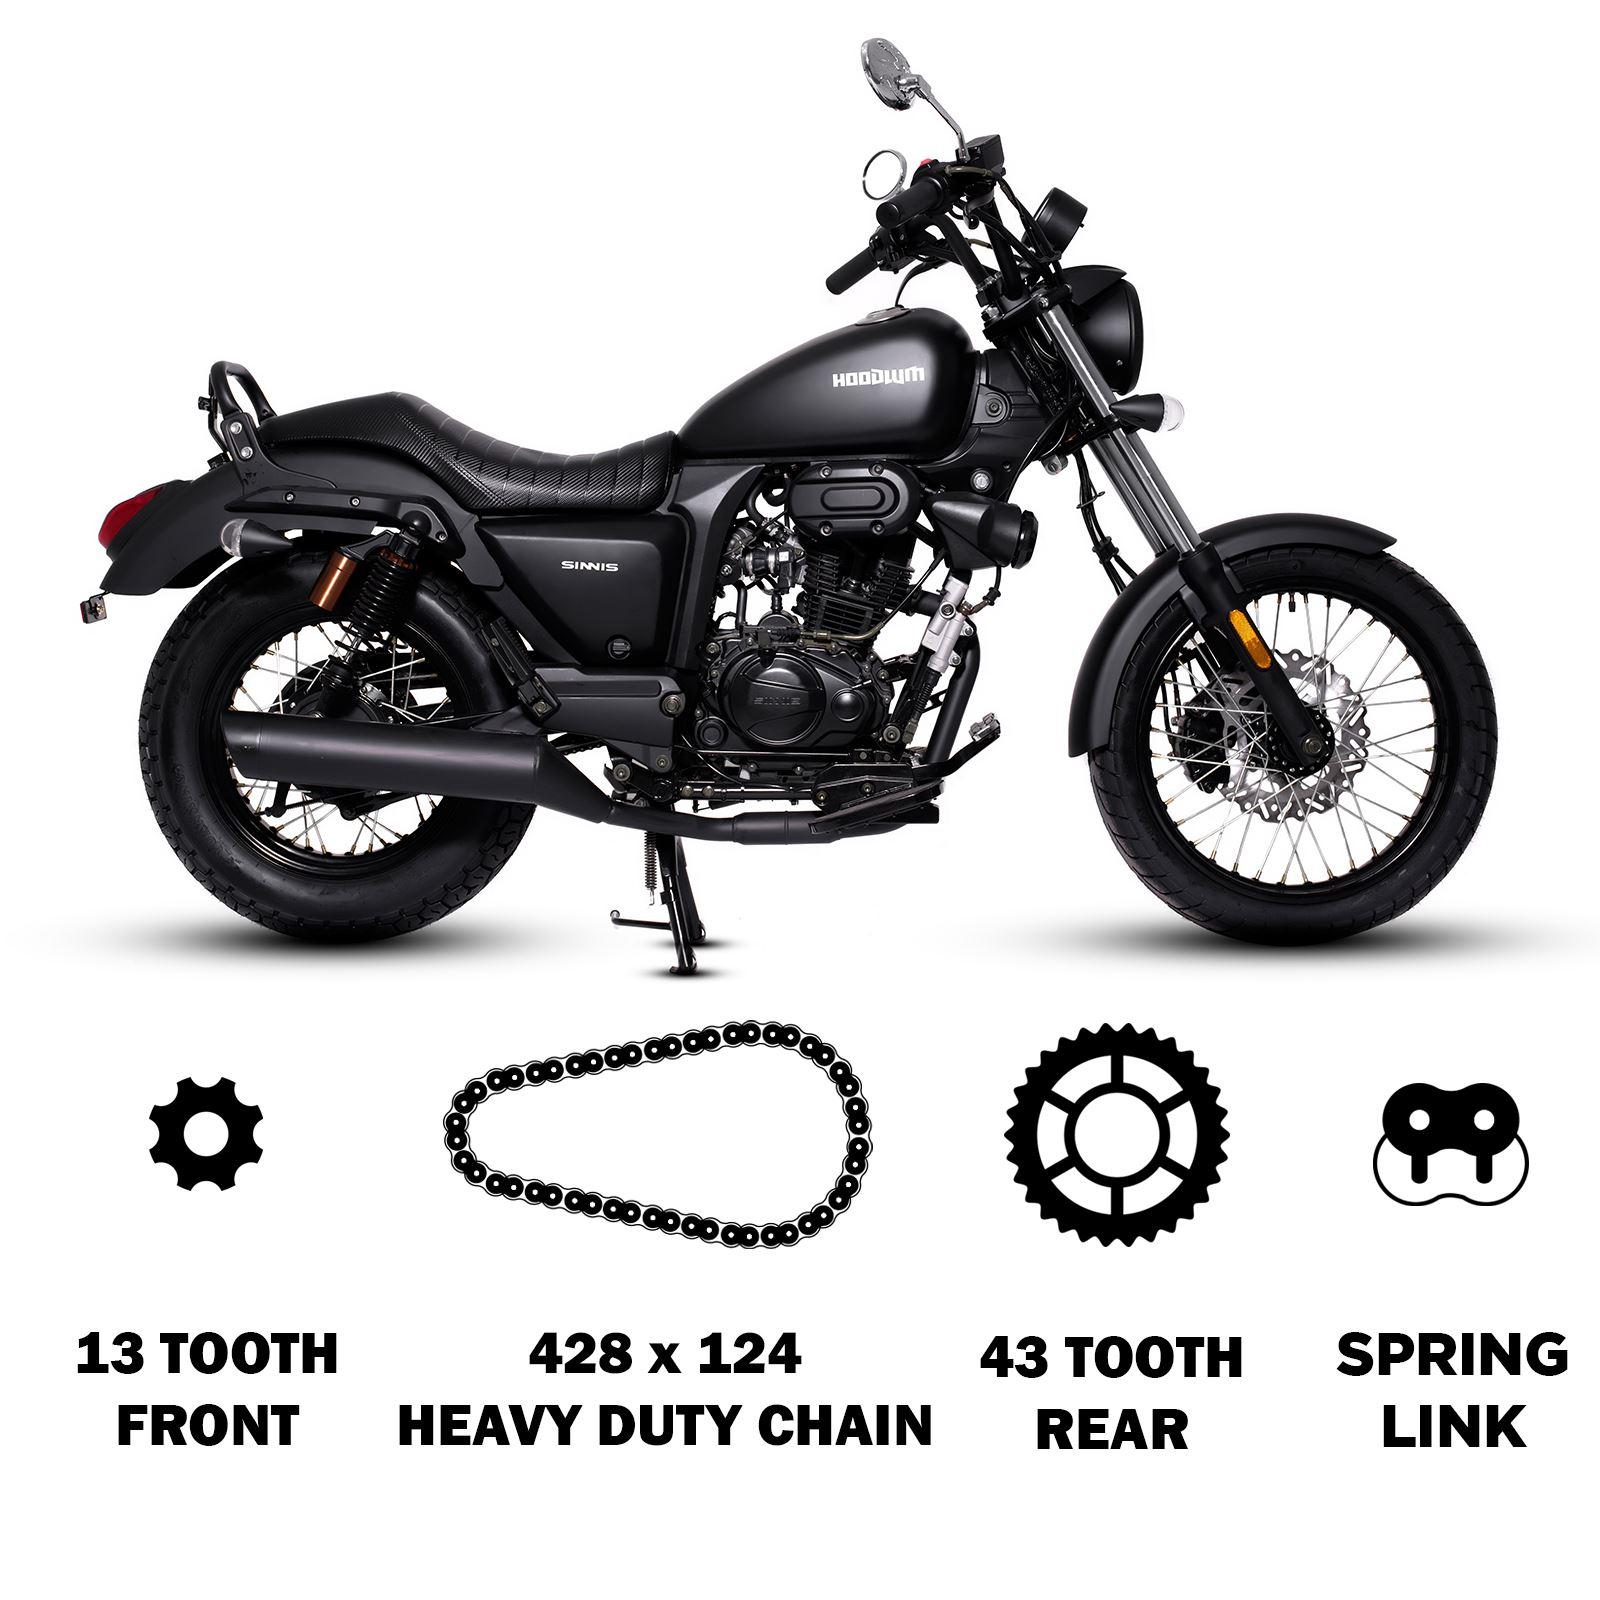 DID Gold/&Black Chain and Sprocket Kit Sinnis Apache SM 125 QM125GY-H 17-19